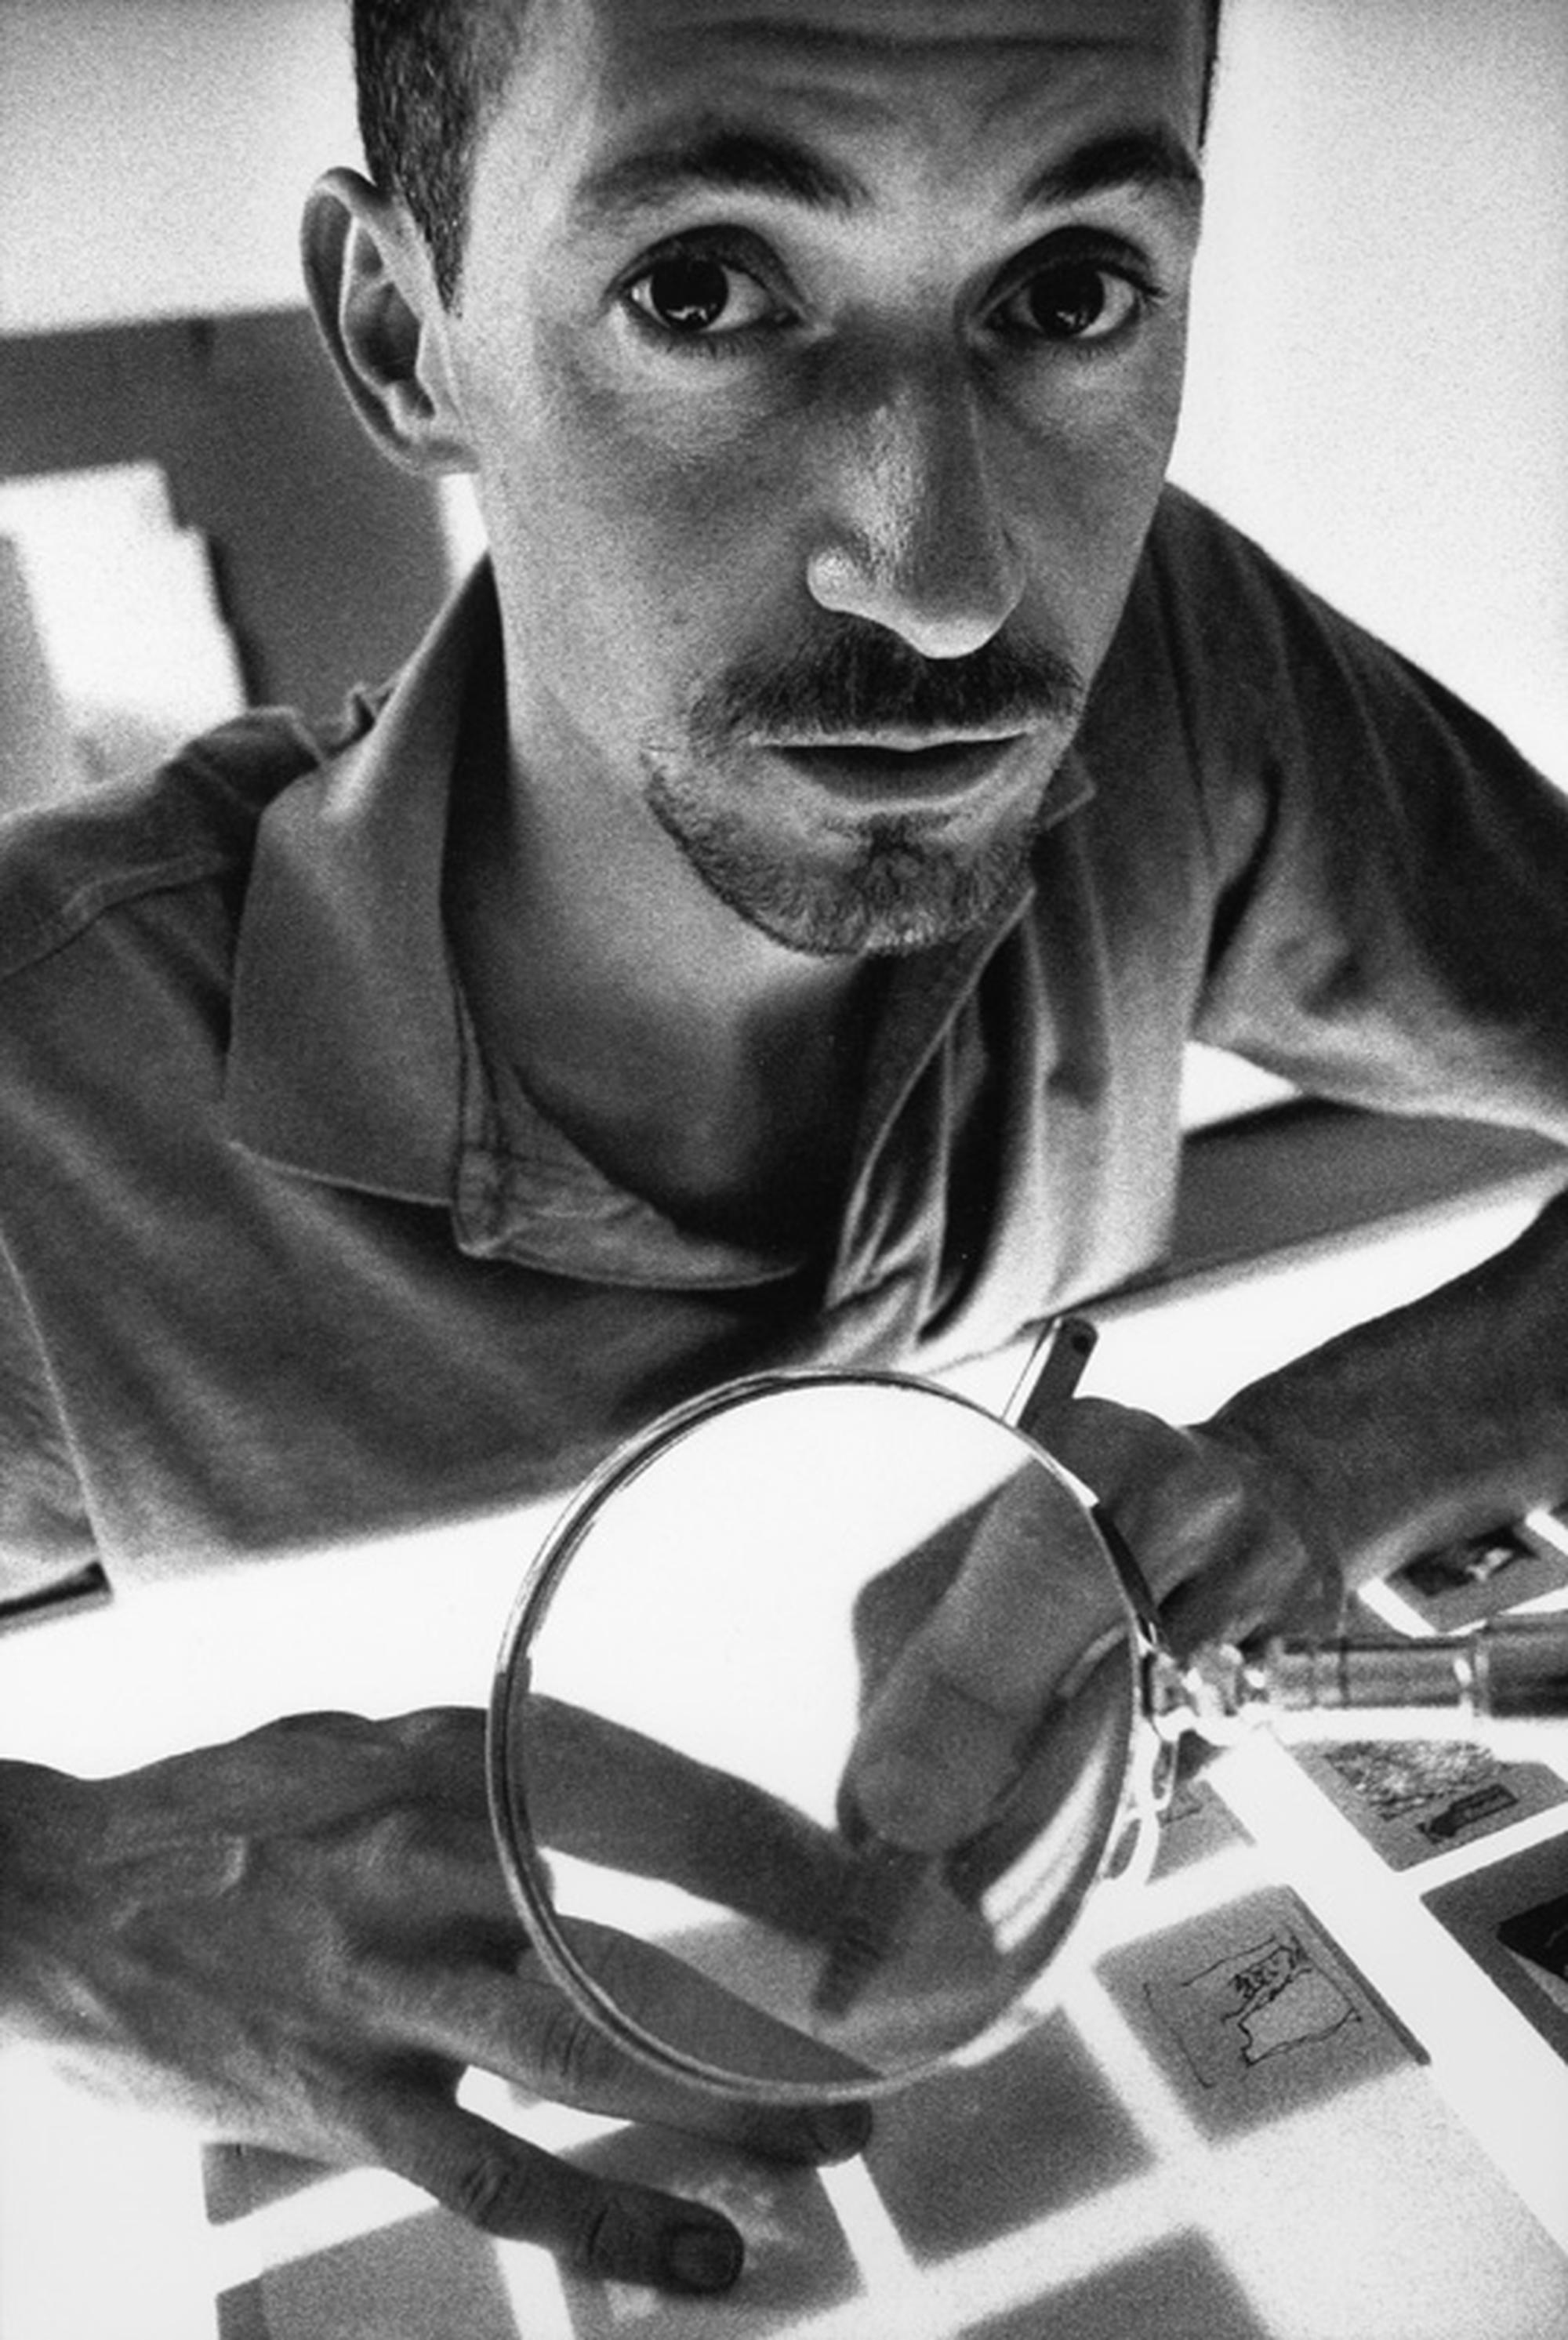 Stefano Arienti, Photo © Armin Linke, 1993